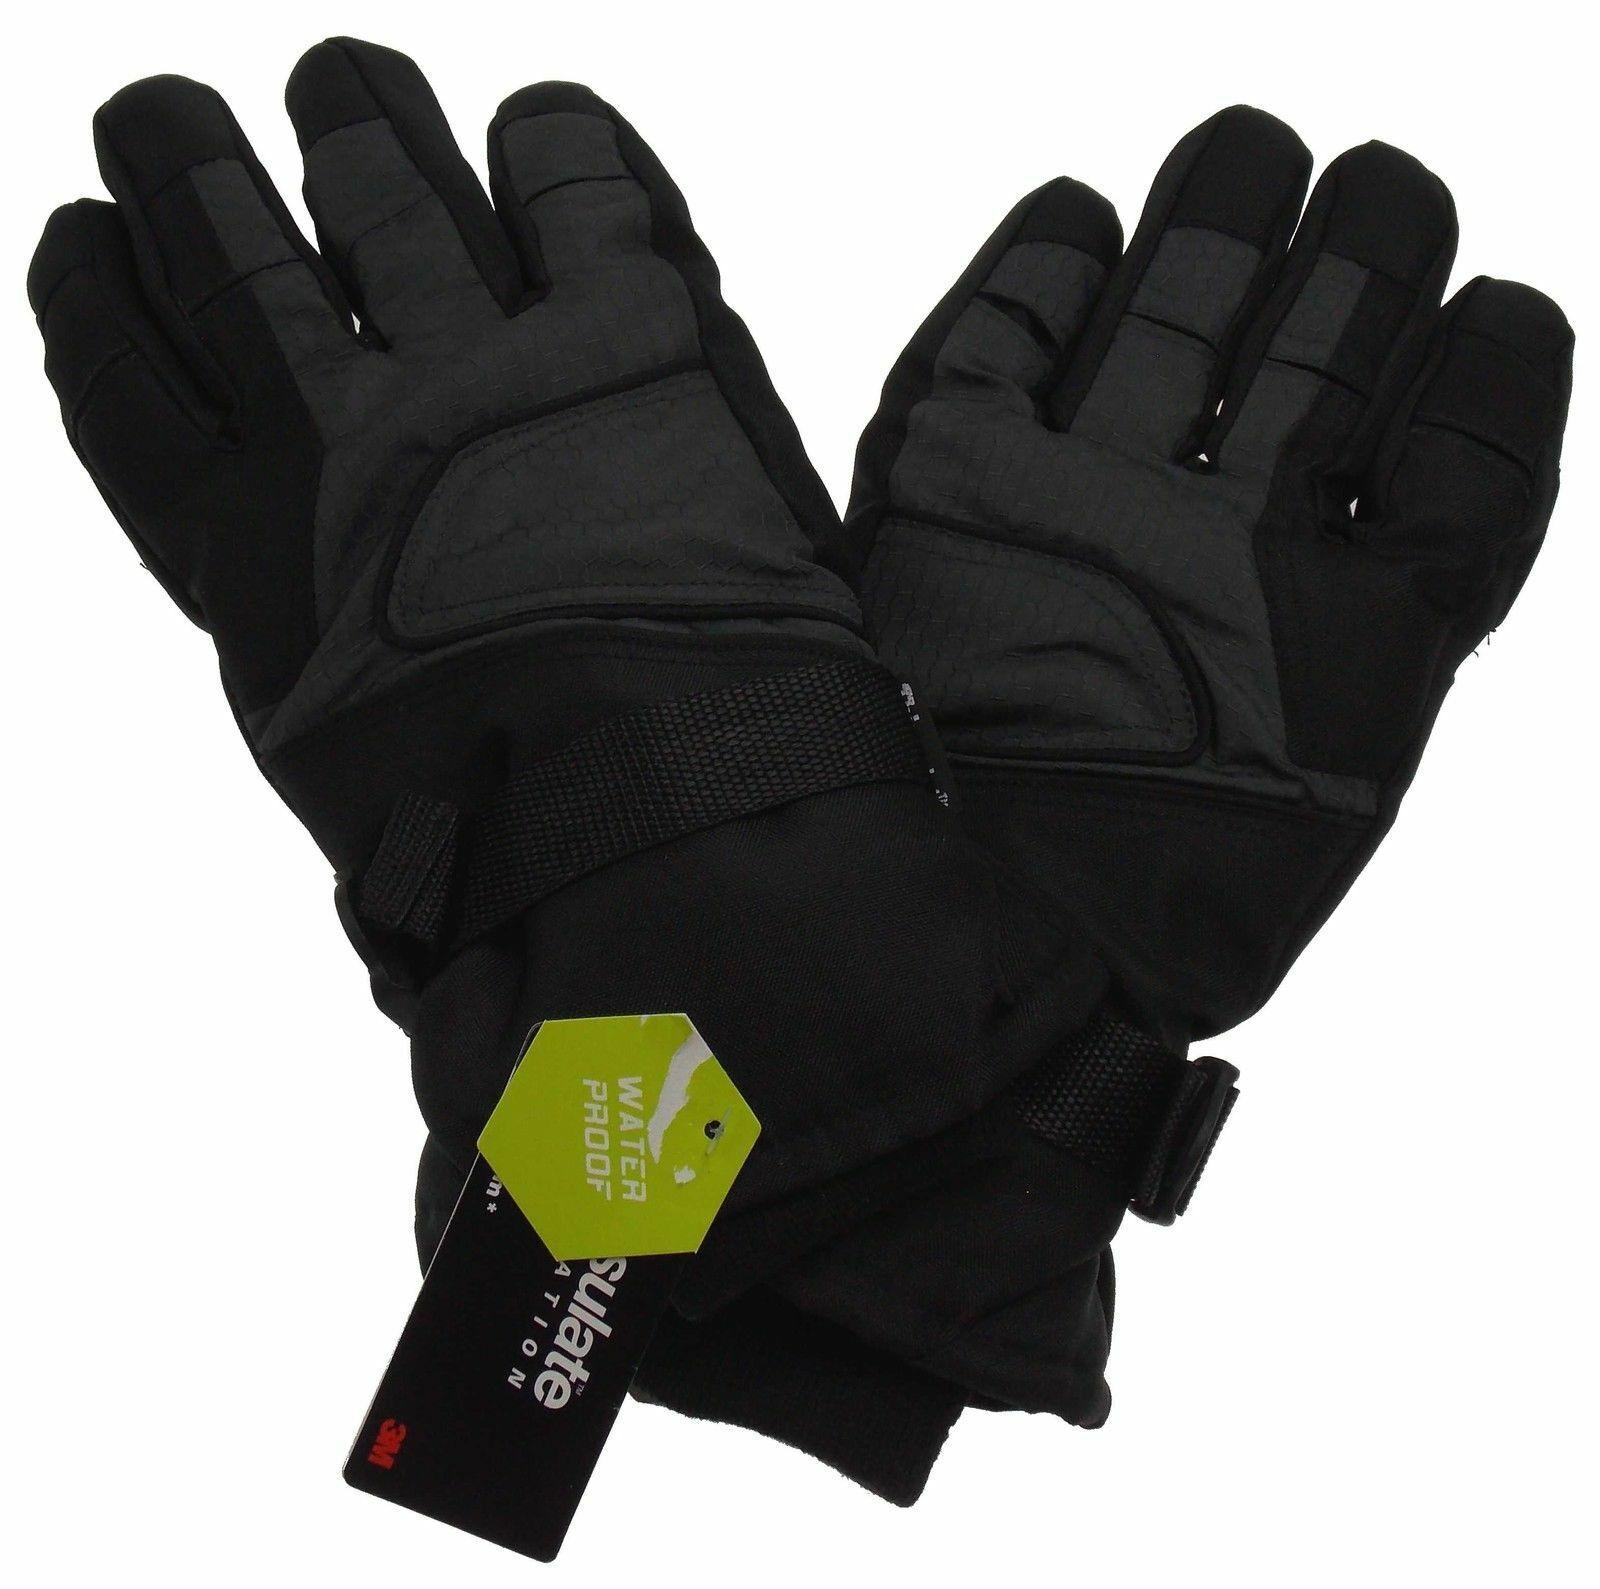 Athletech Mens Black Gray Ski Gloves 3M Thinsulate Insulation Waterproof M L XL